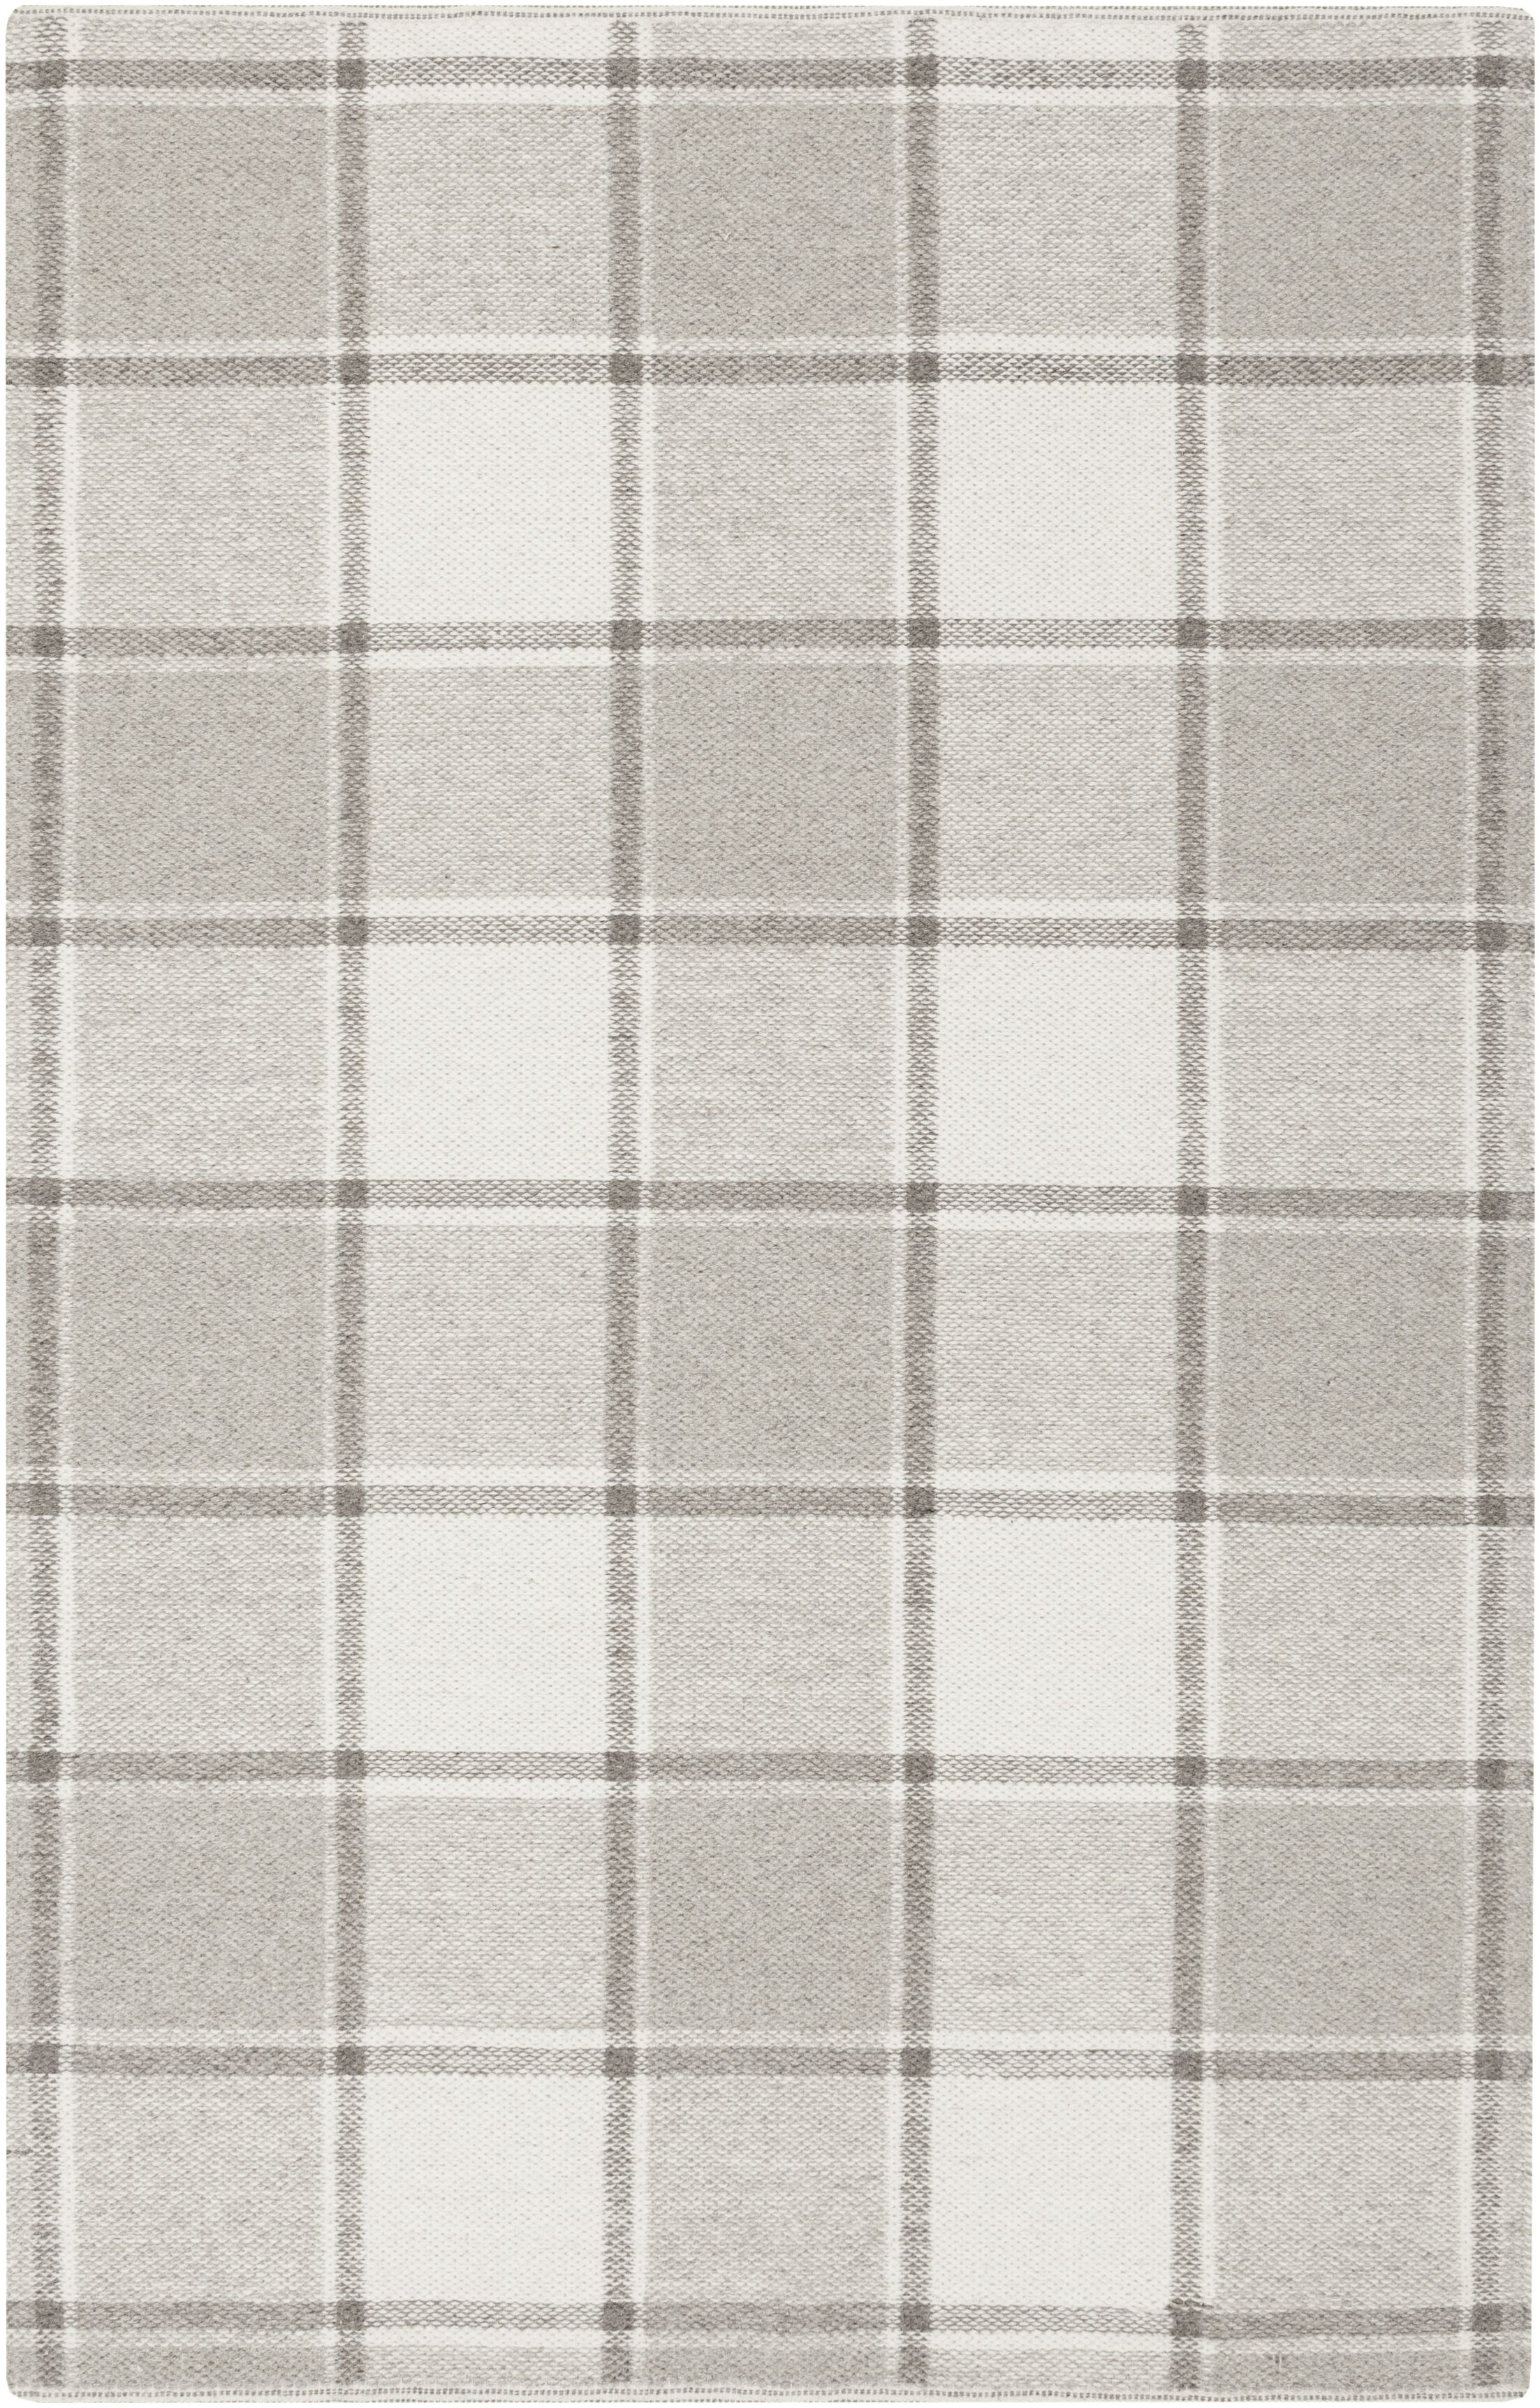 Meyers Hand-Woven Gray Area Rug Rug Size: Rectangle 4' x 6'